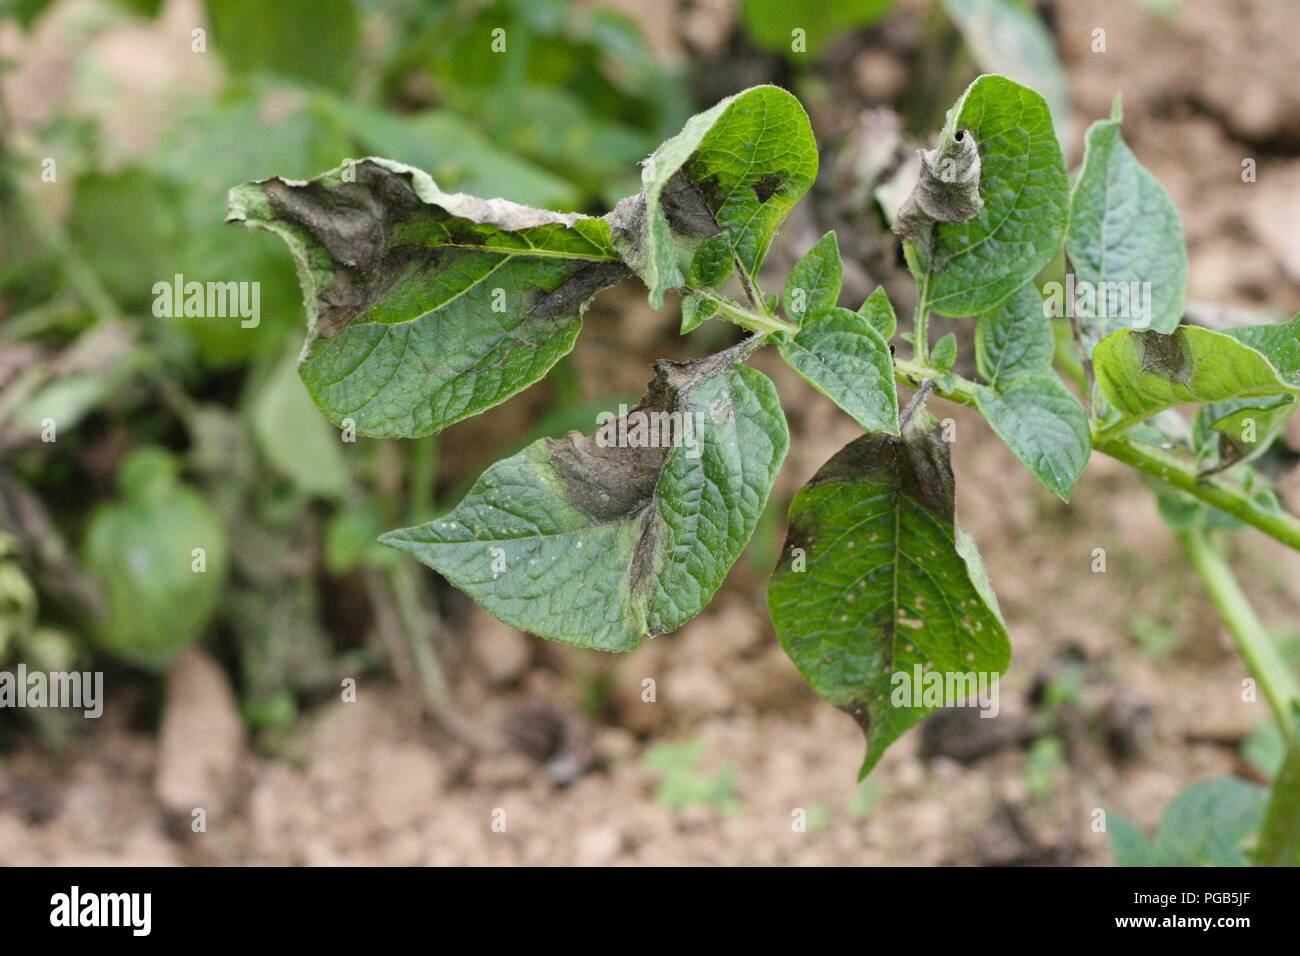 Kartoffel Kraut- und Knollenfäule Symptom auf Blätter Stockbild